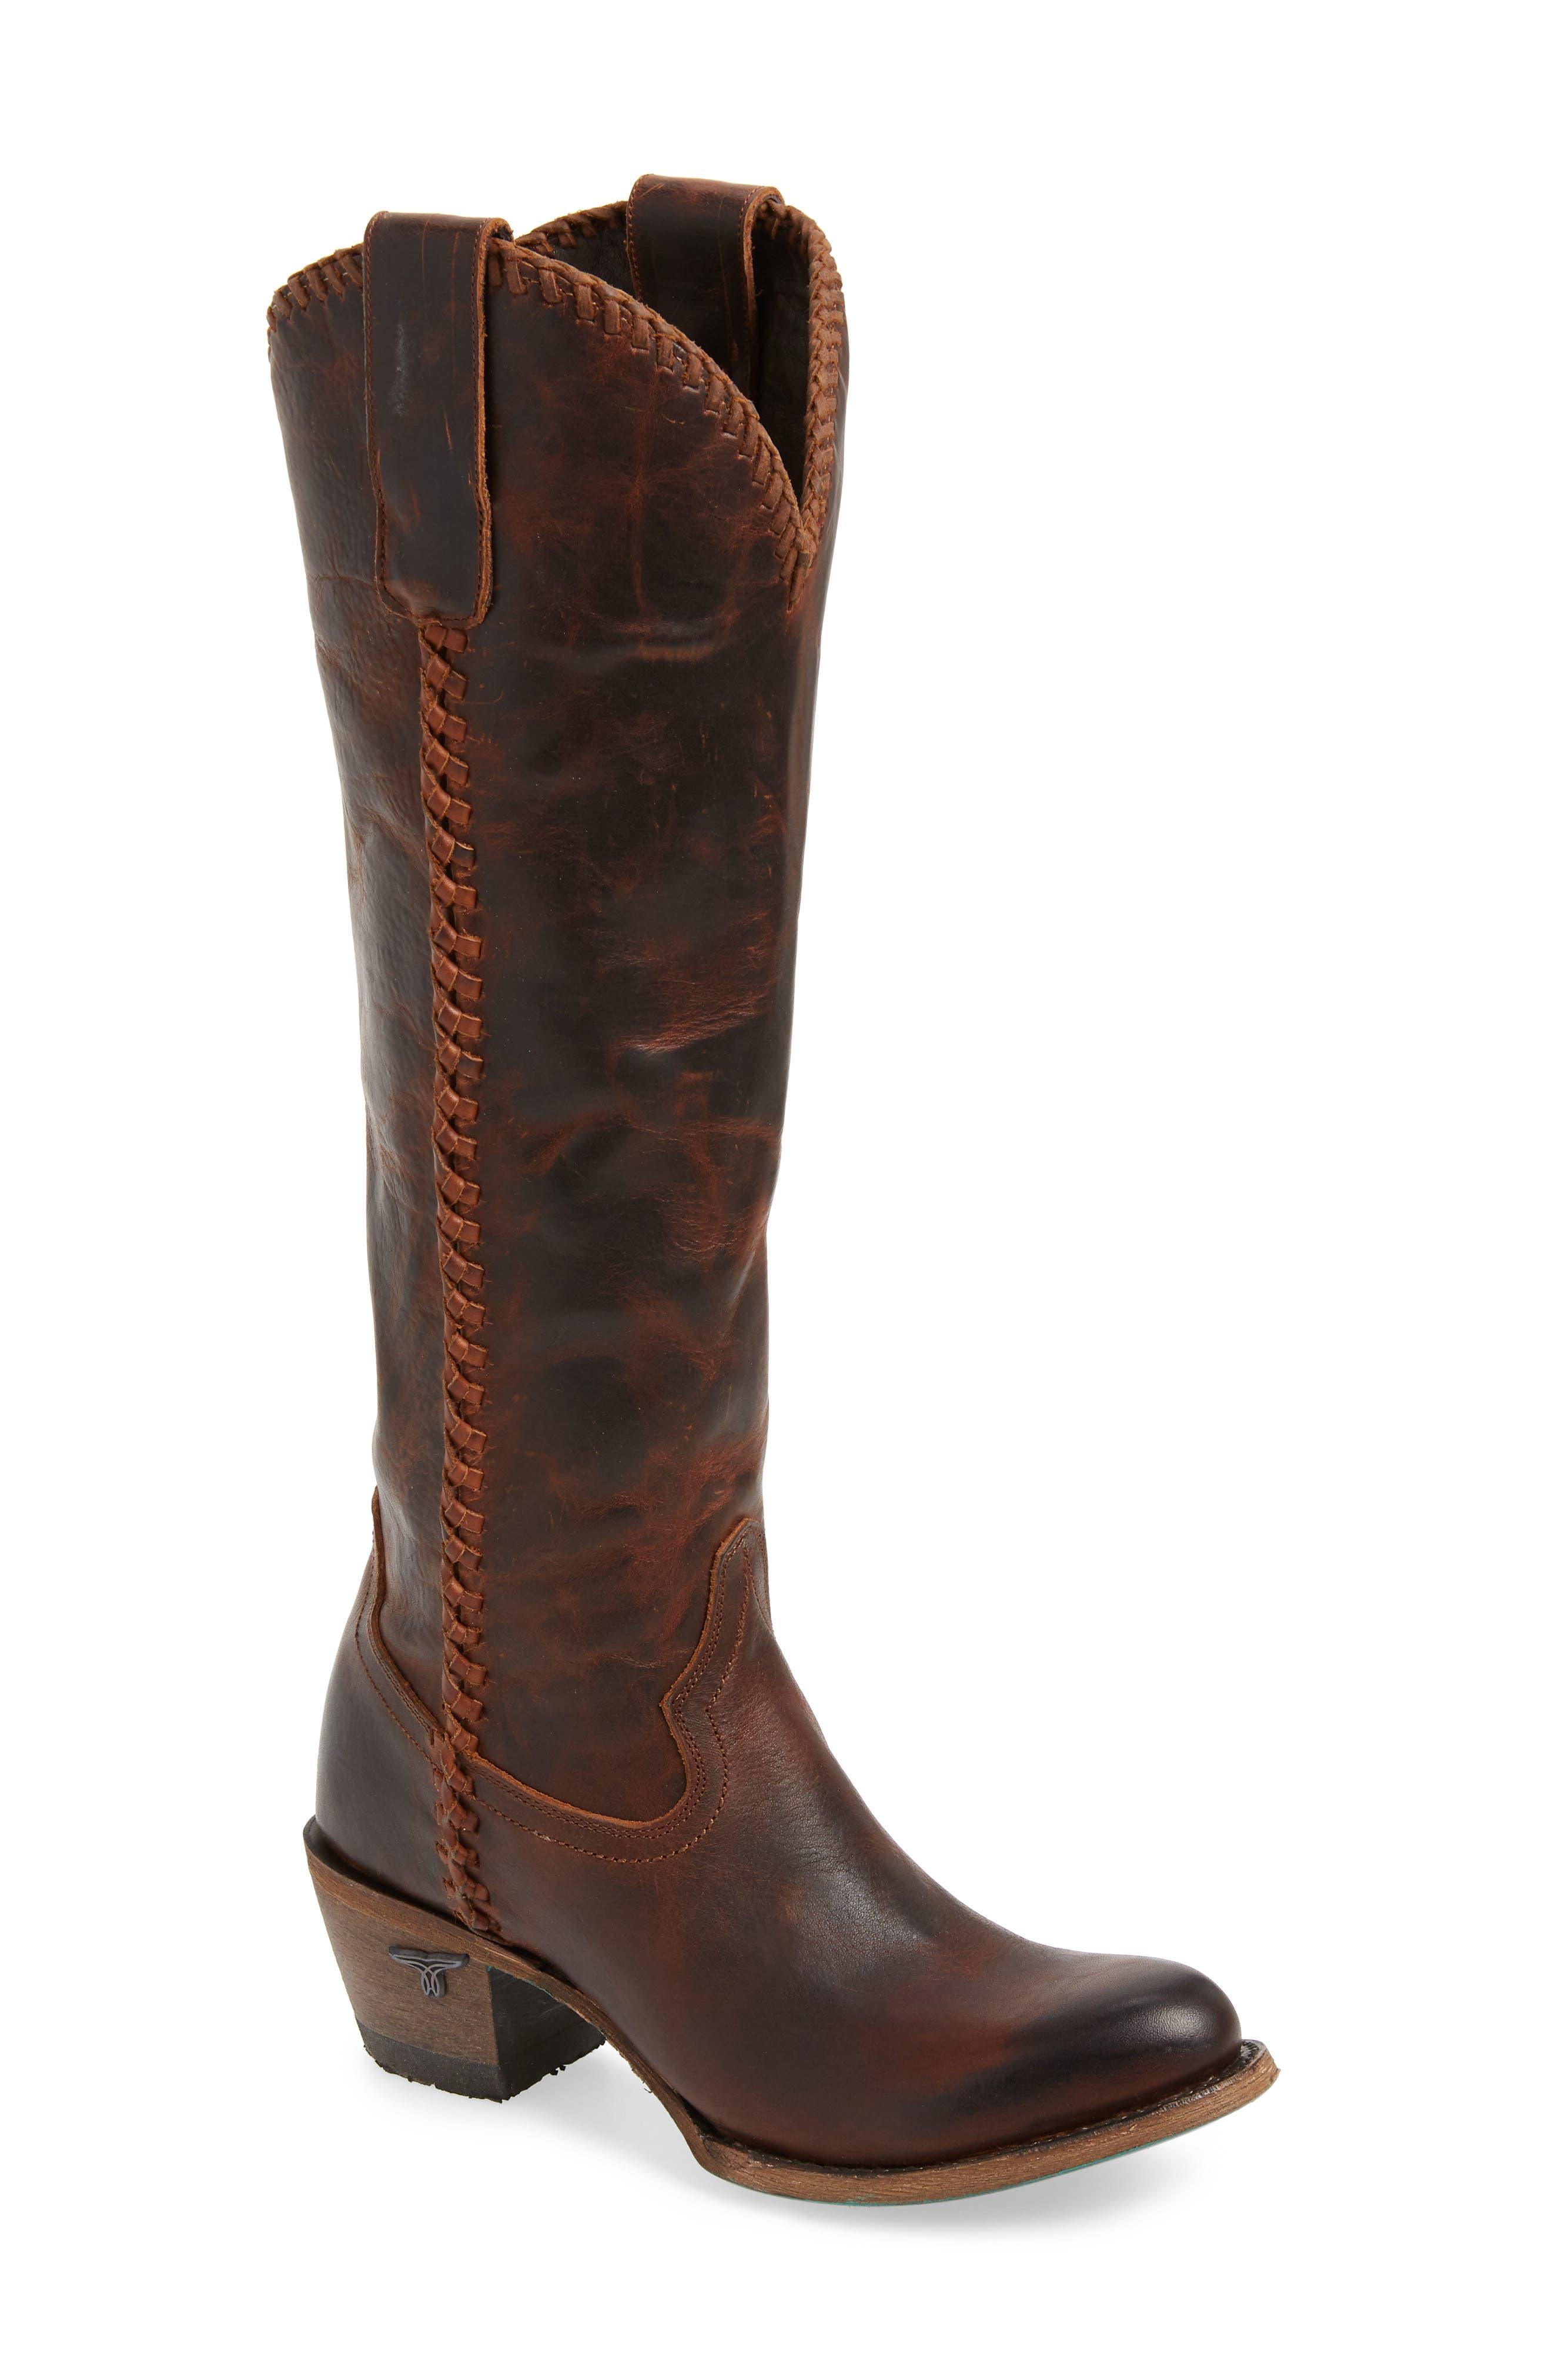 LANE BOOTS Plain Jane Knee High Western Boot, Main, color, COGNAC LEATHER